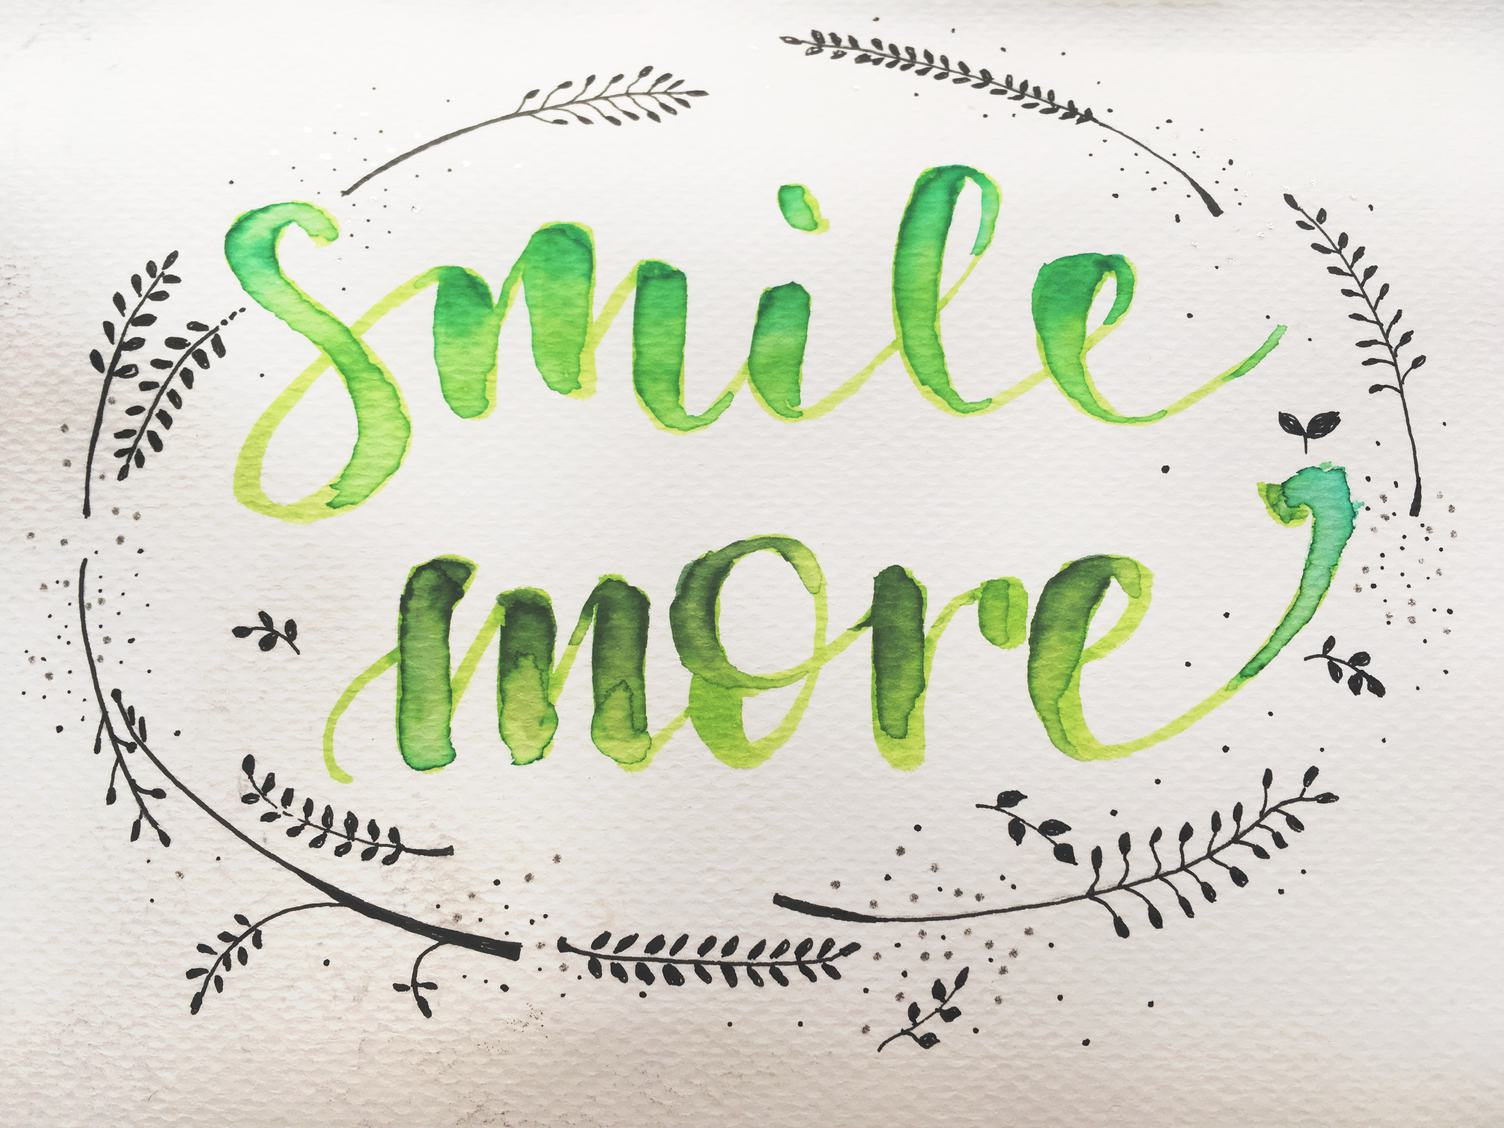 Smile More Calligraphy Inscription